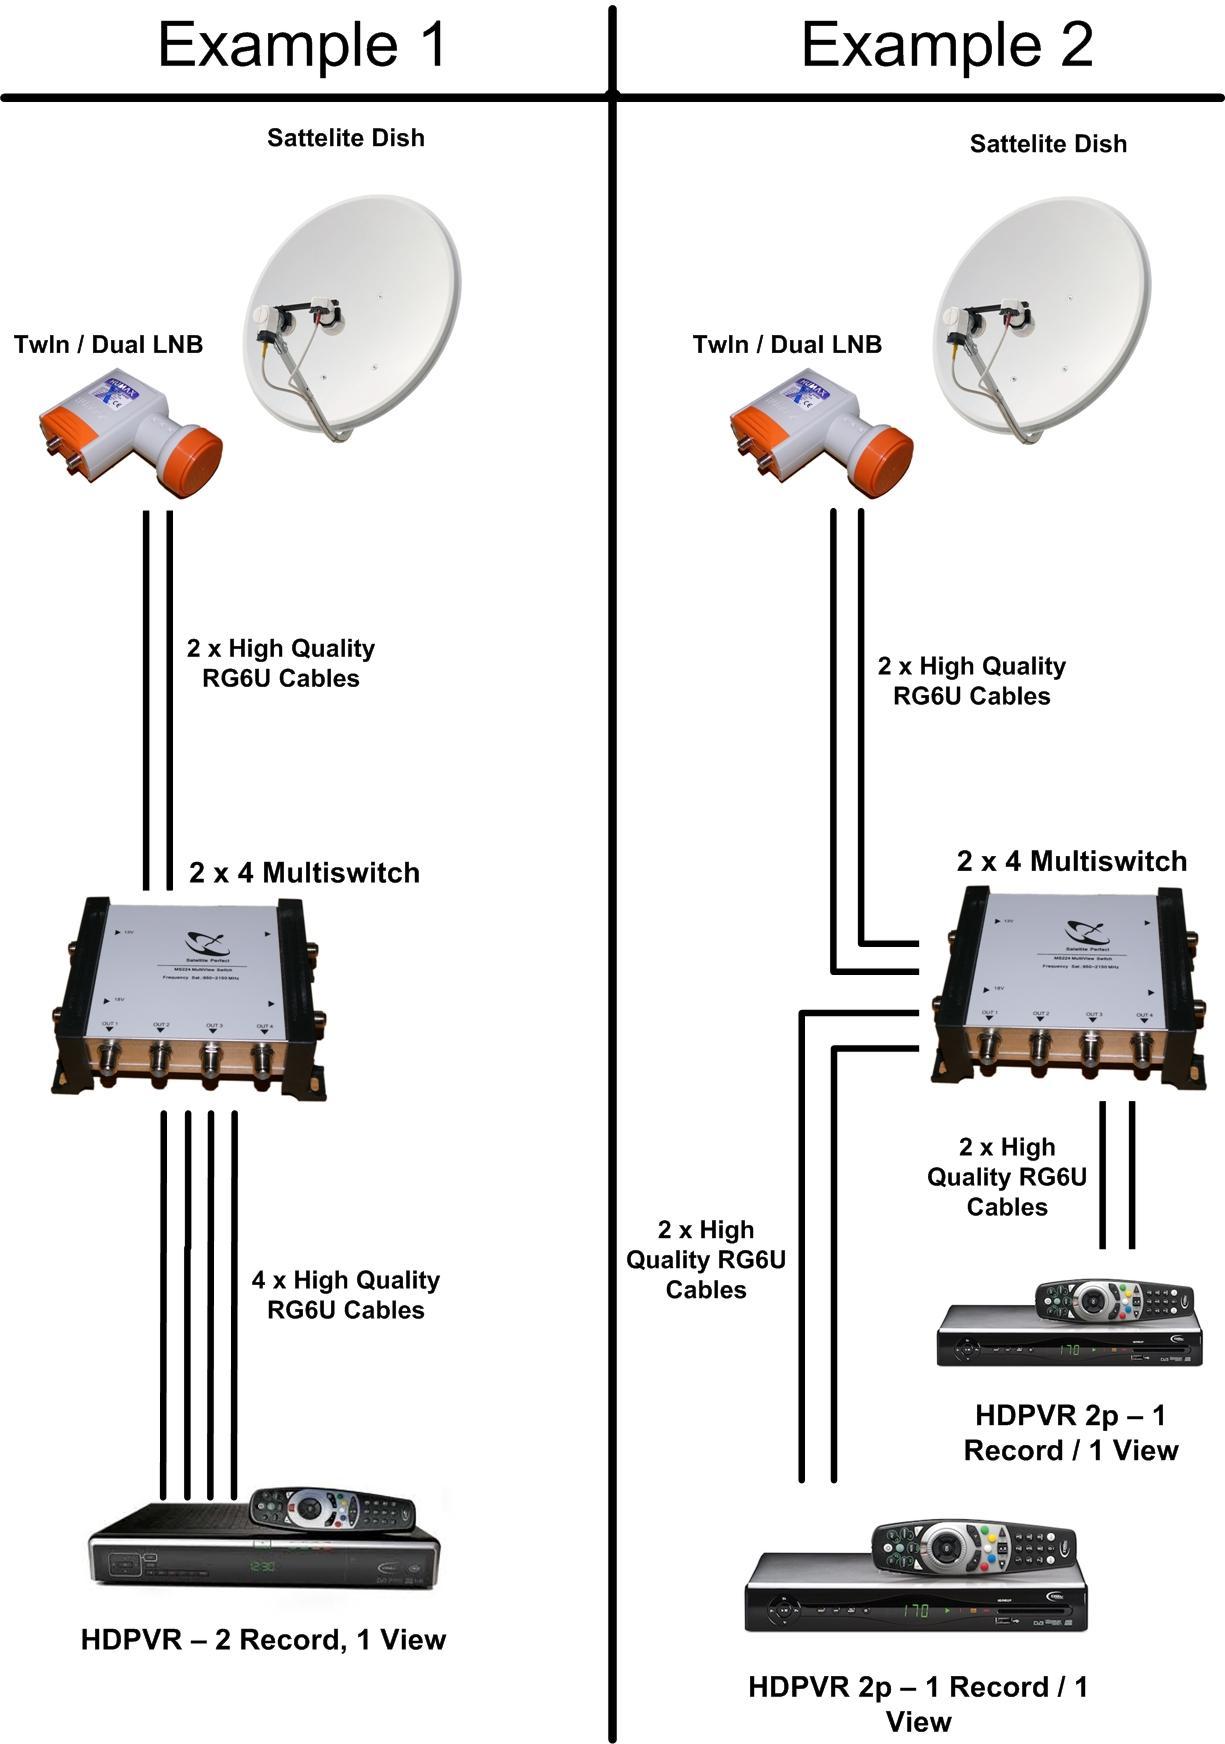 hight resolution of dstv installations 0833726342 signal correction upgrades on at t u verse box